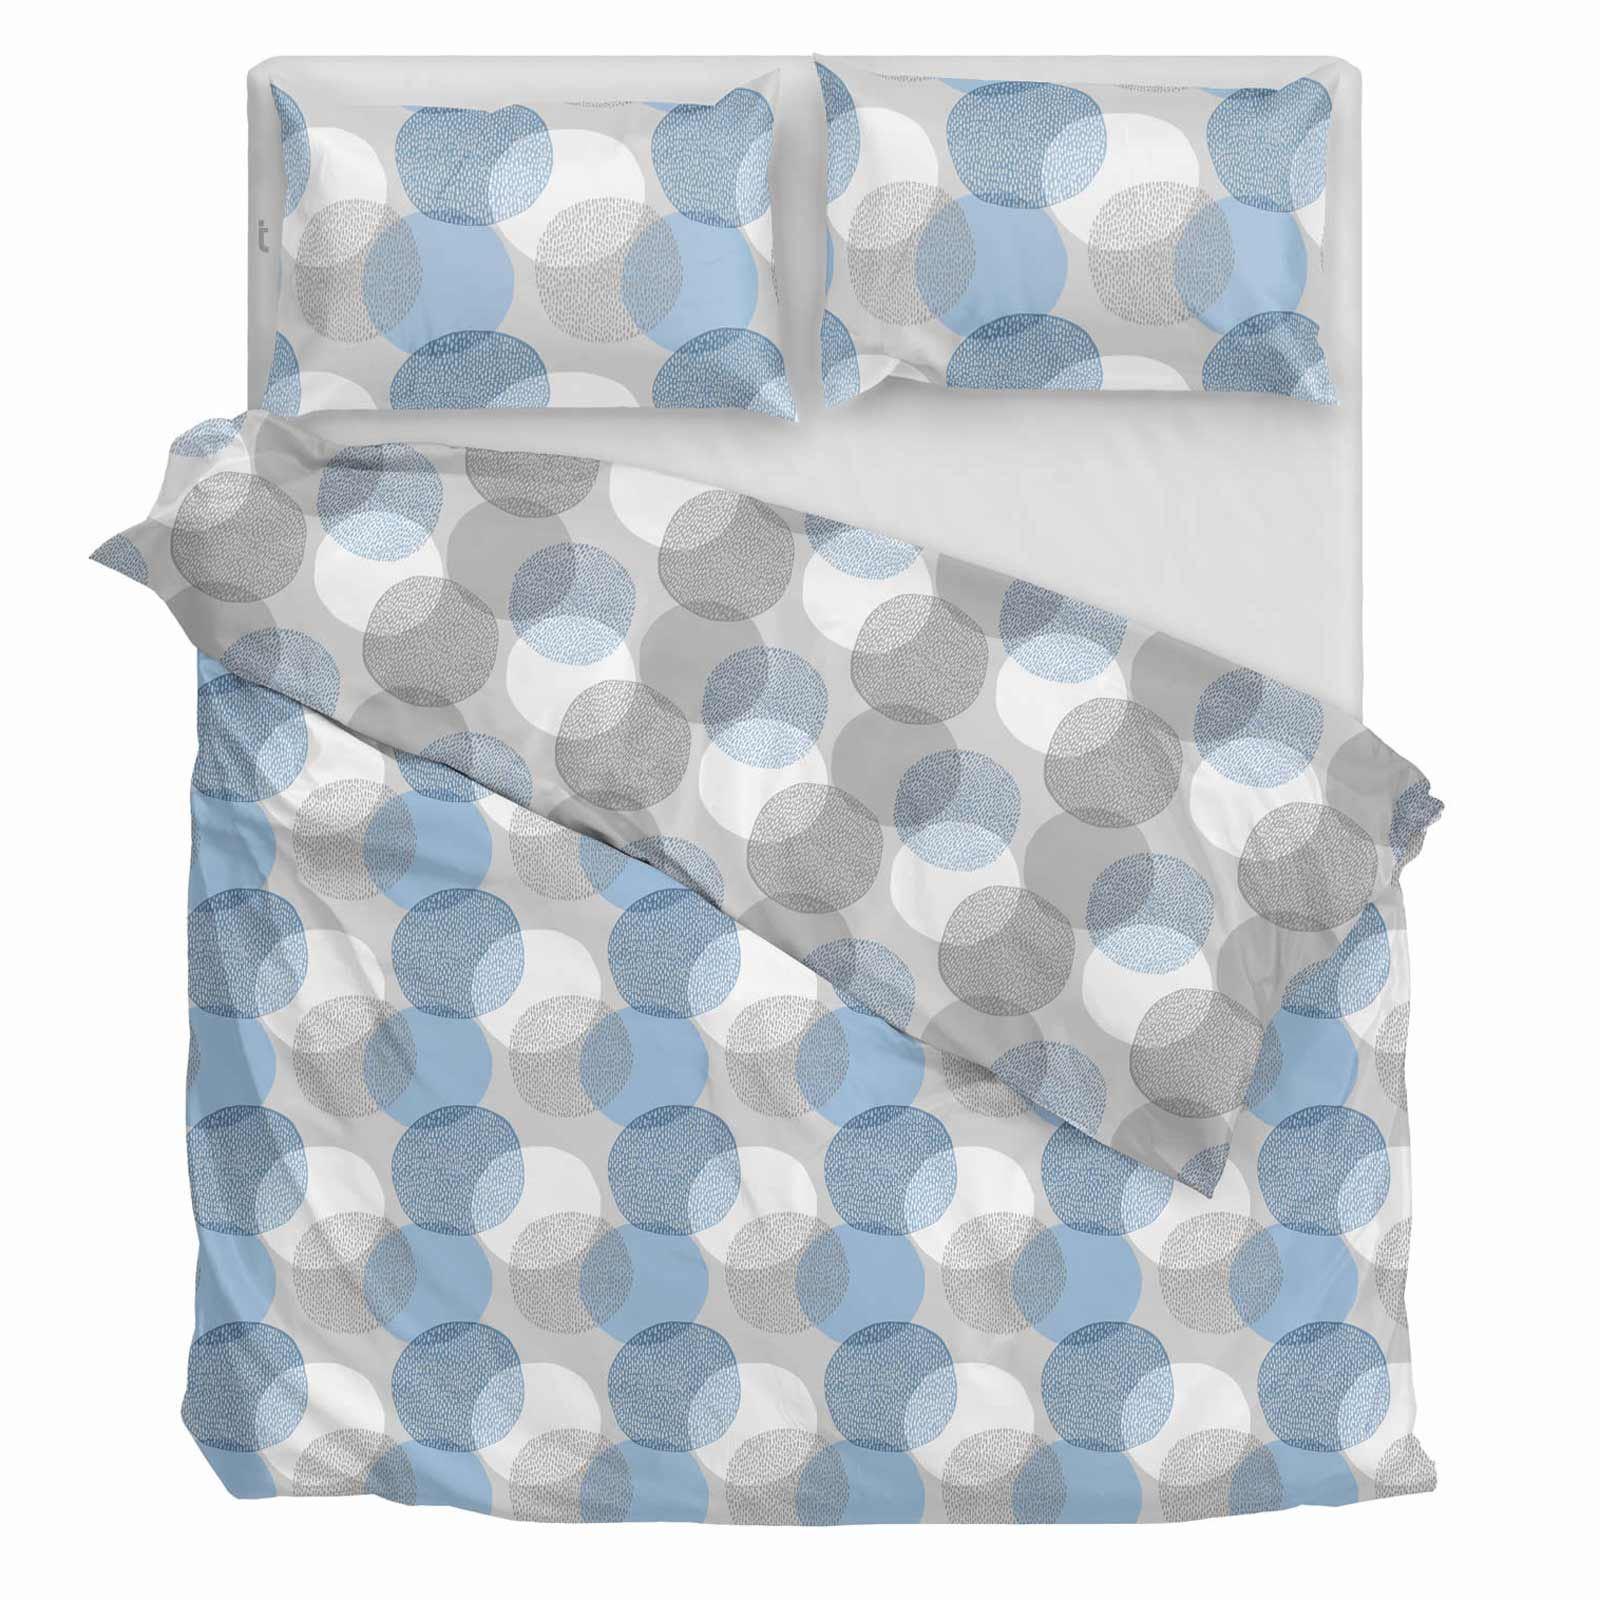 Funda-nordica-azul-azul-marino-verde-azulado-edredon-algodon-estampado-juego-conjuntos-de-cama-cubre miniatura 6